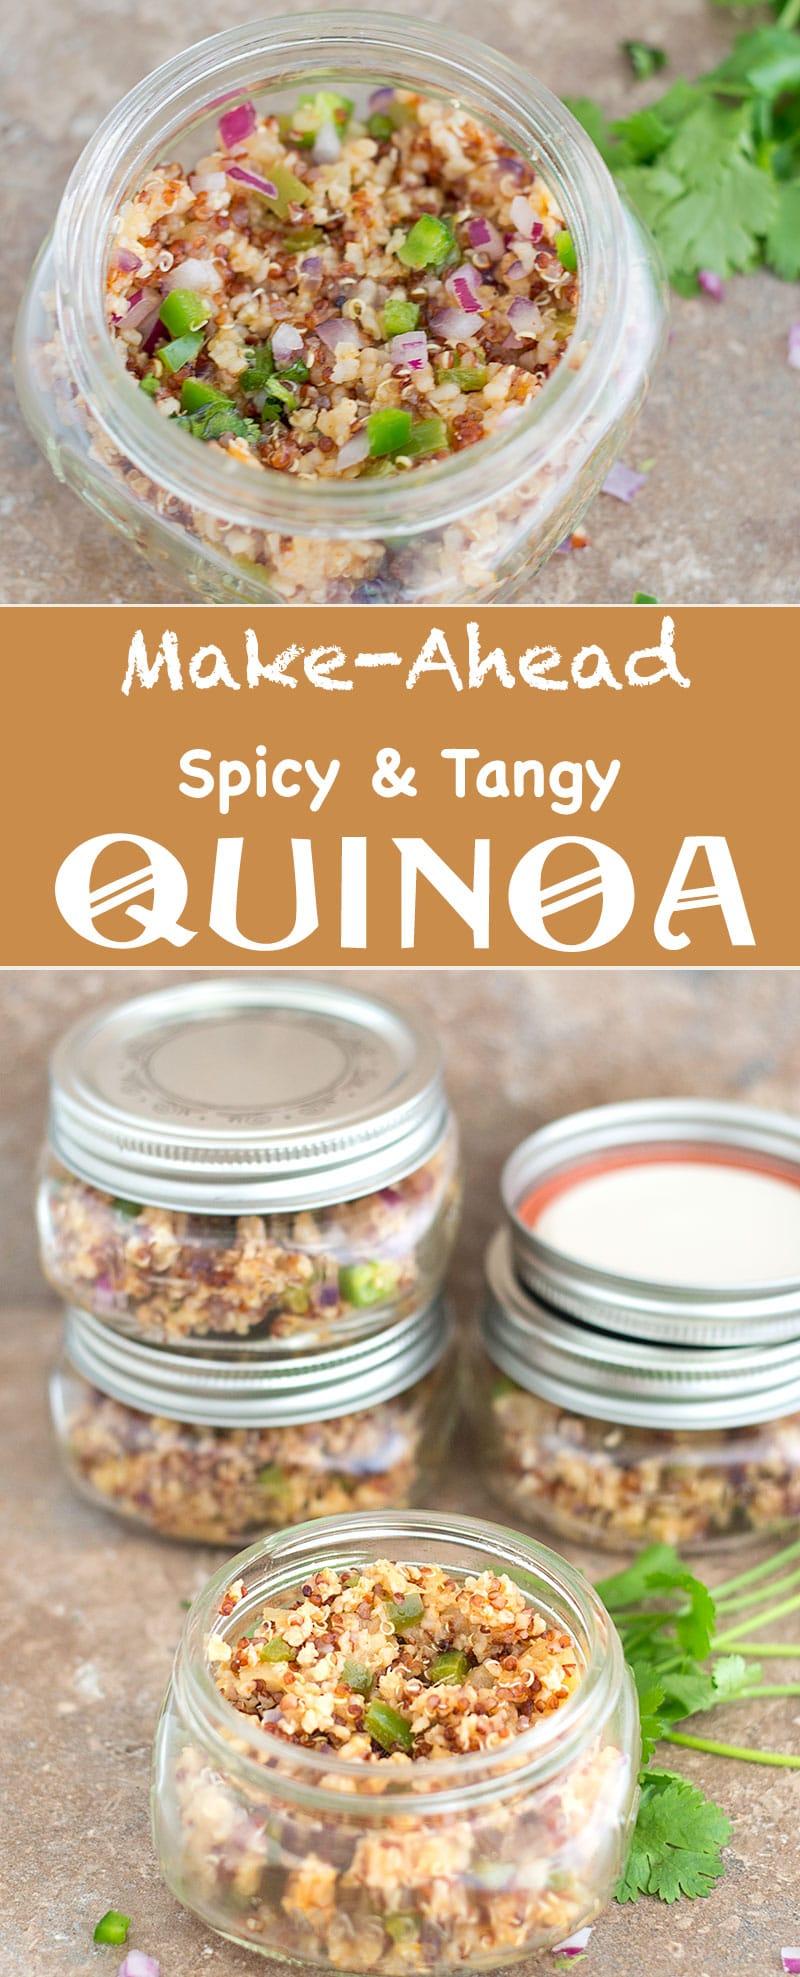 make ahead spicy quinoa PIN